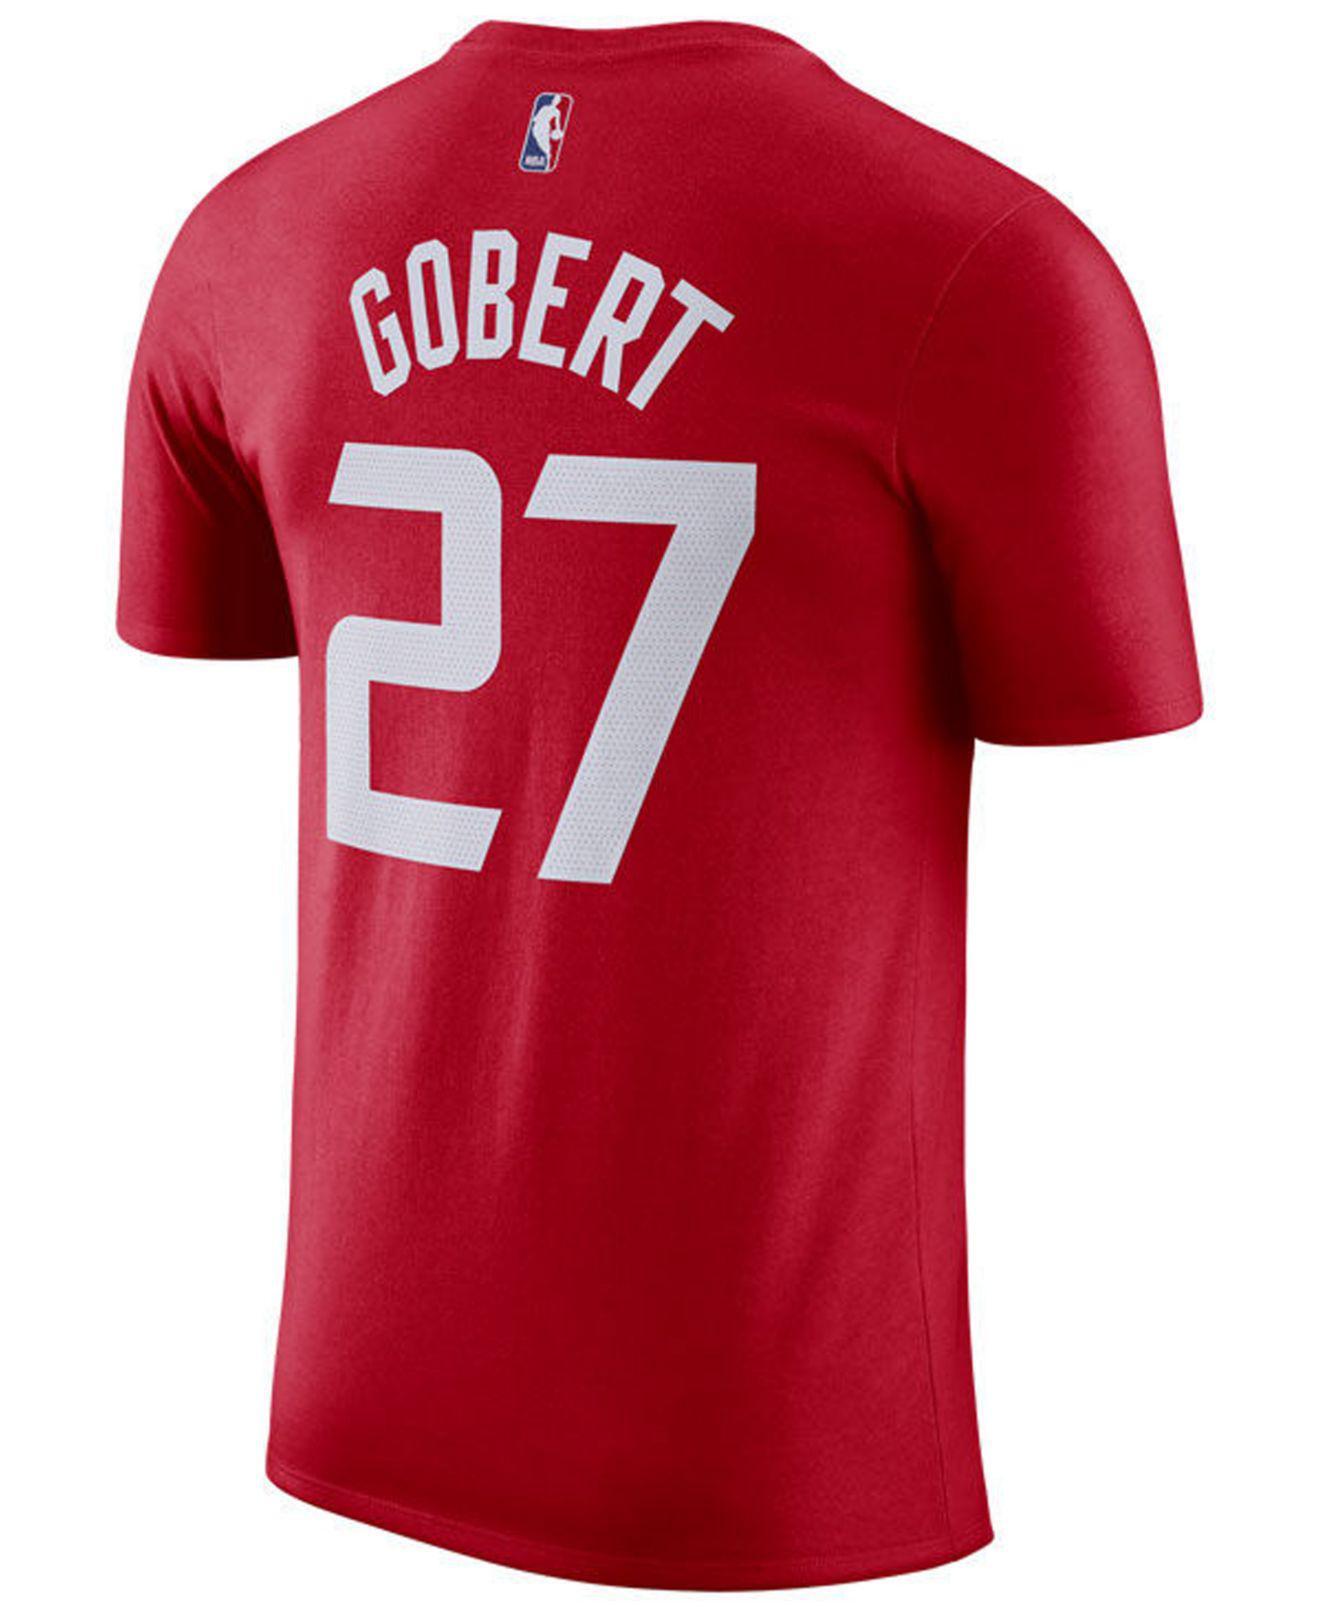 cc75364971dd Lyst - Nike Rudy Robert Utah Jazz City Player T-shirt 2018 in Red ...